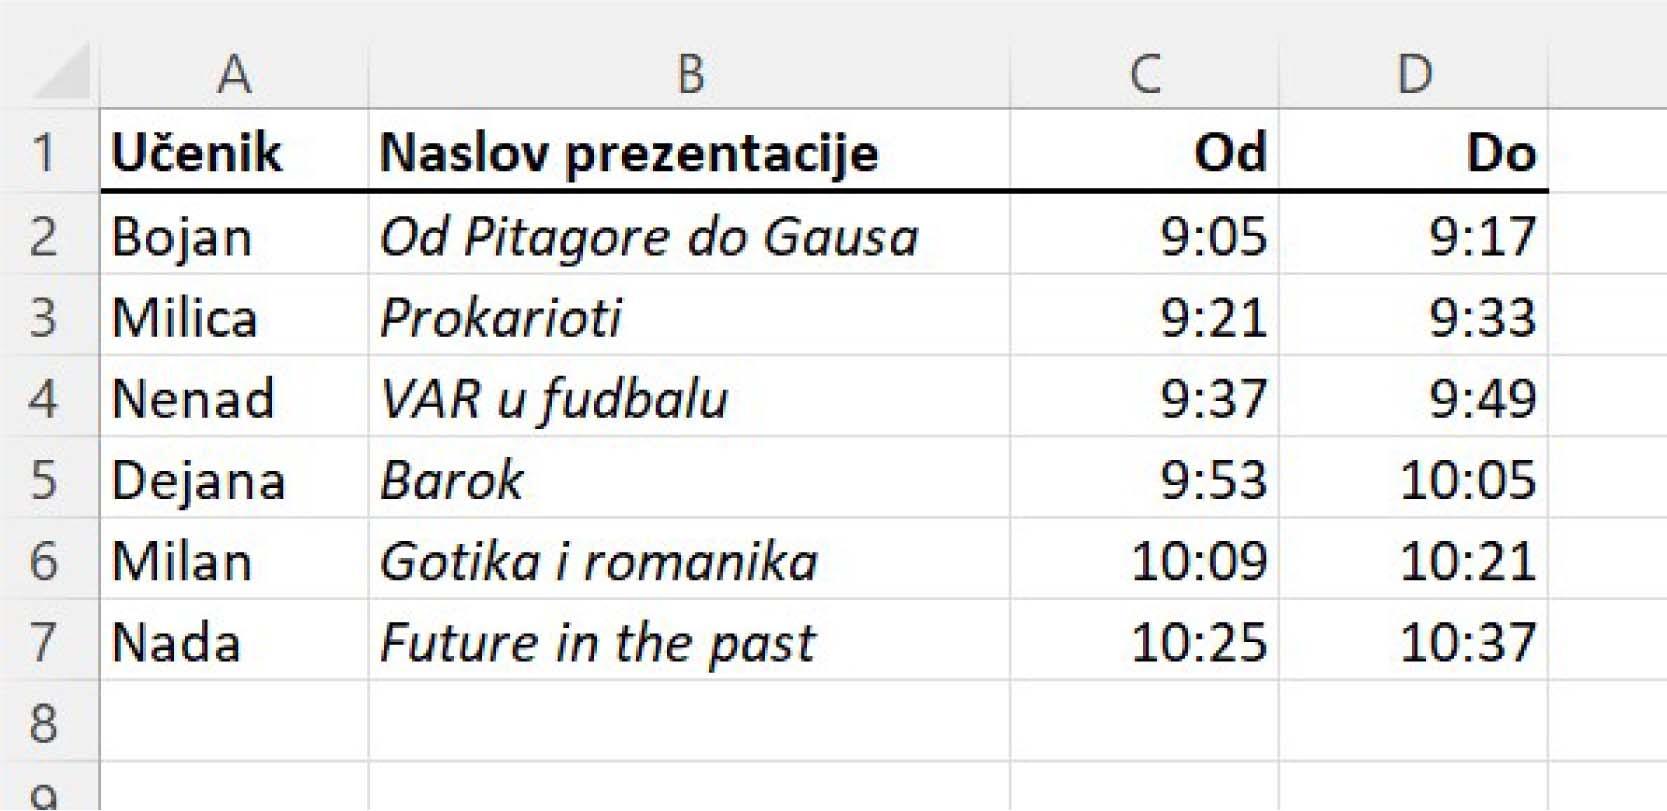 https://petljamediastorage.blob.core.windows.net/root/Media/Default/Kursevi/OnlineNastava/8_razred_IKT_DigitalnaPismenost/DataTypes213.jpg